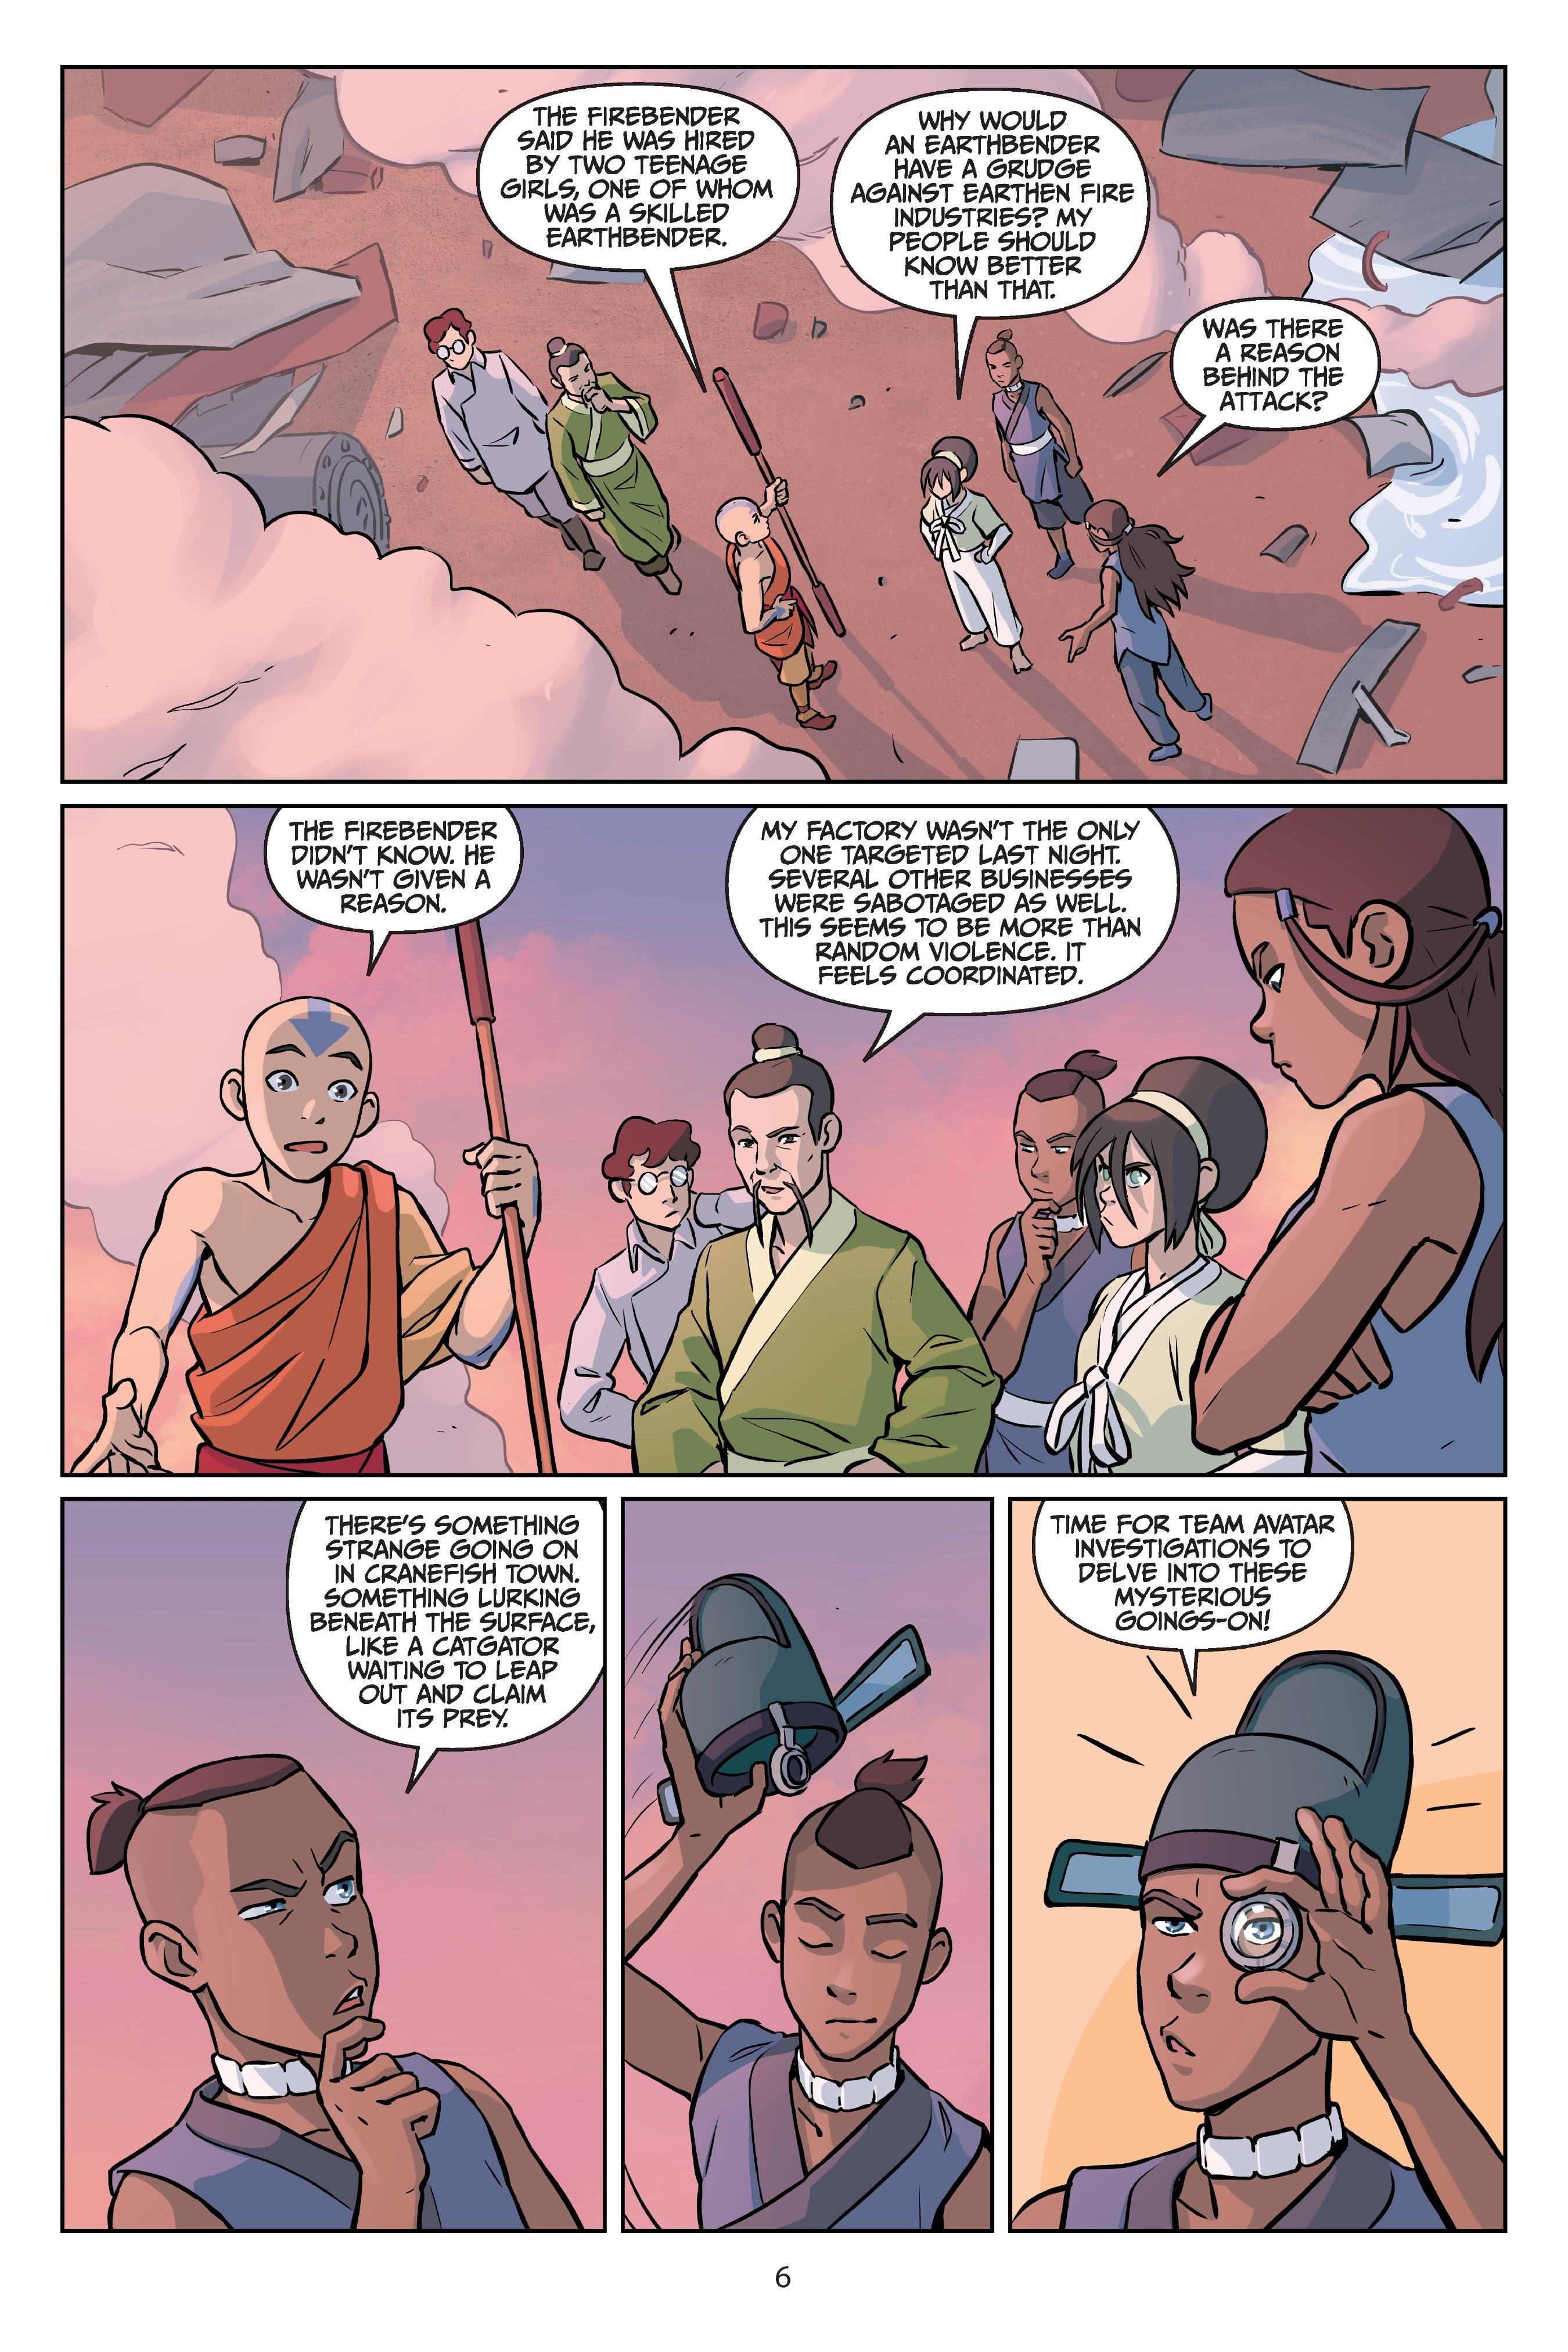 Nickelodeon Avatar: The Last Airbender - Imbalance TPB_2 Page 6